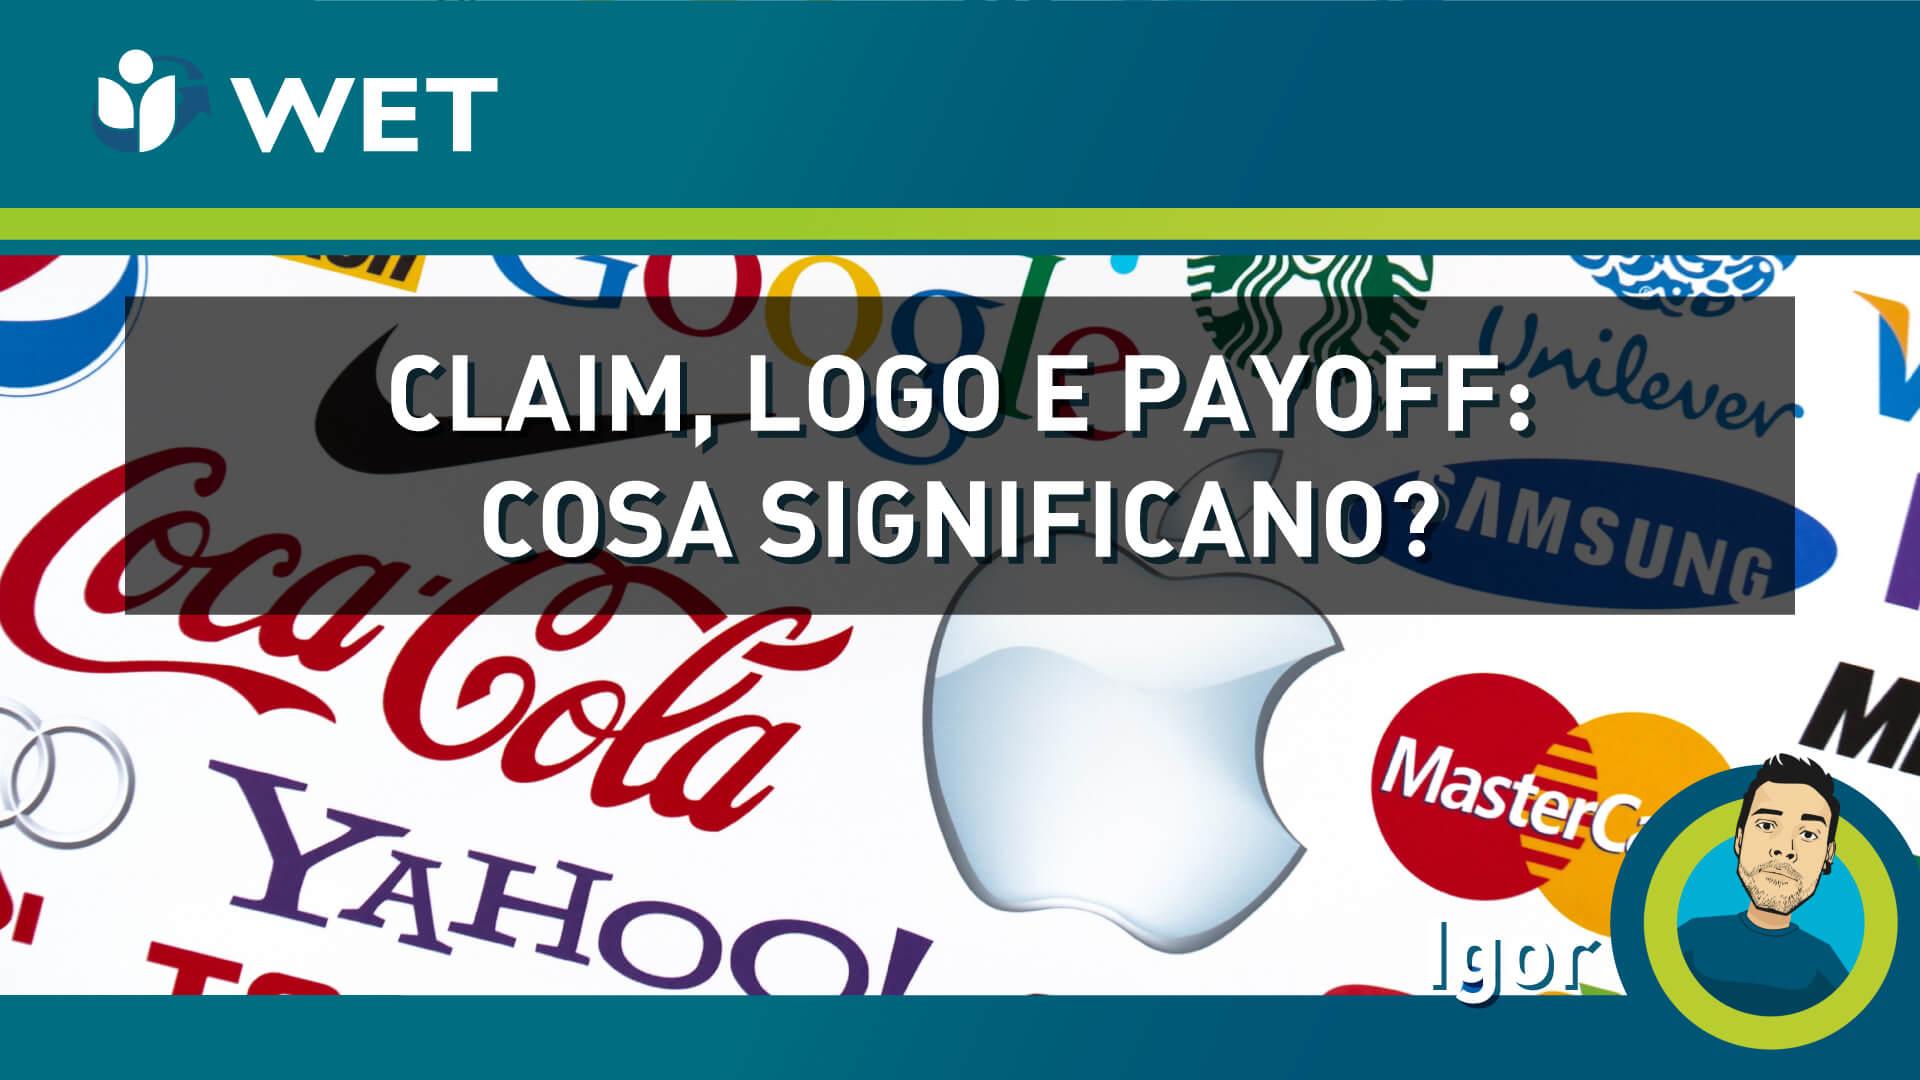 Logo, payoff e claim: I 3 TERMINI UTILI A UNA COMUNICAZIONE EFFICACE